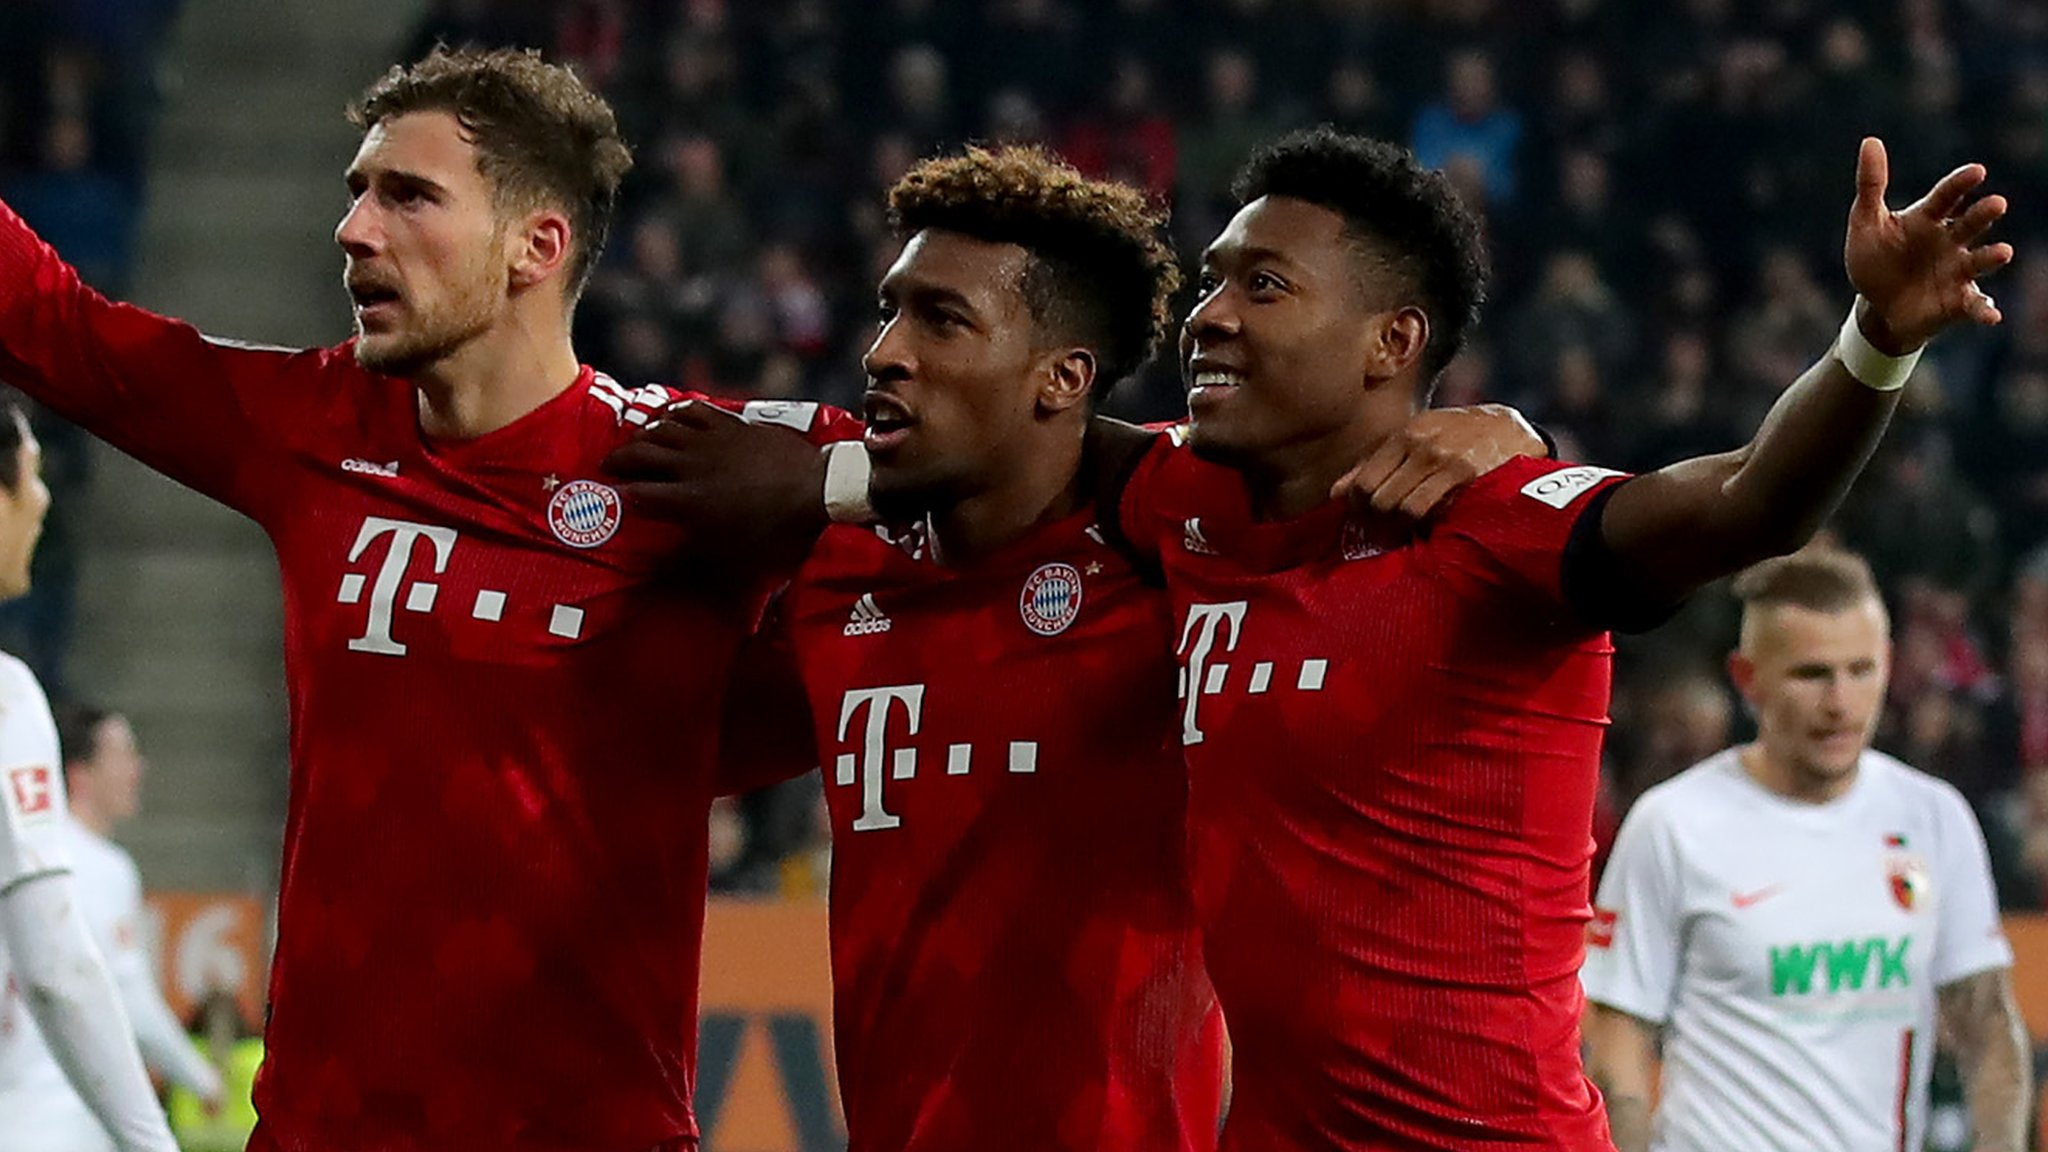 Augsburg 2-3 Bayern Munich: Kingsley Coman scores twice in comeback win